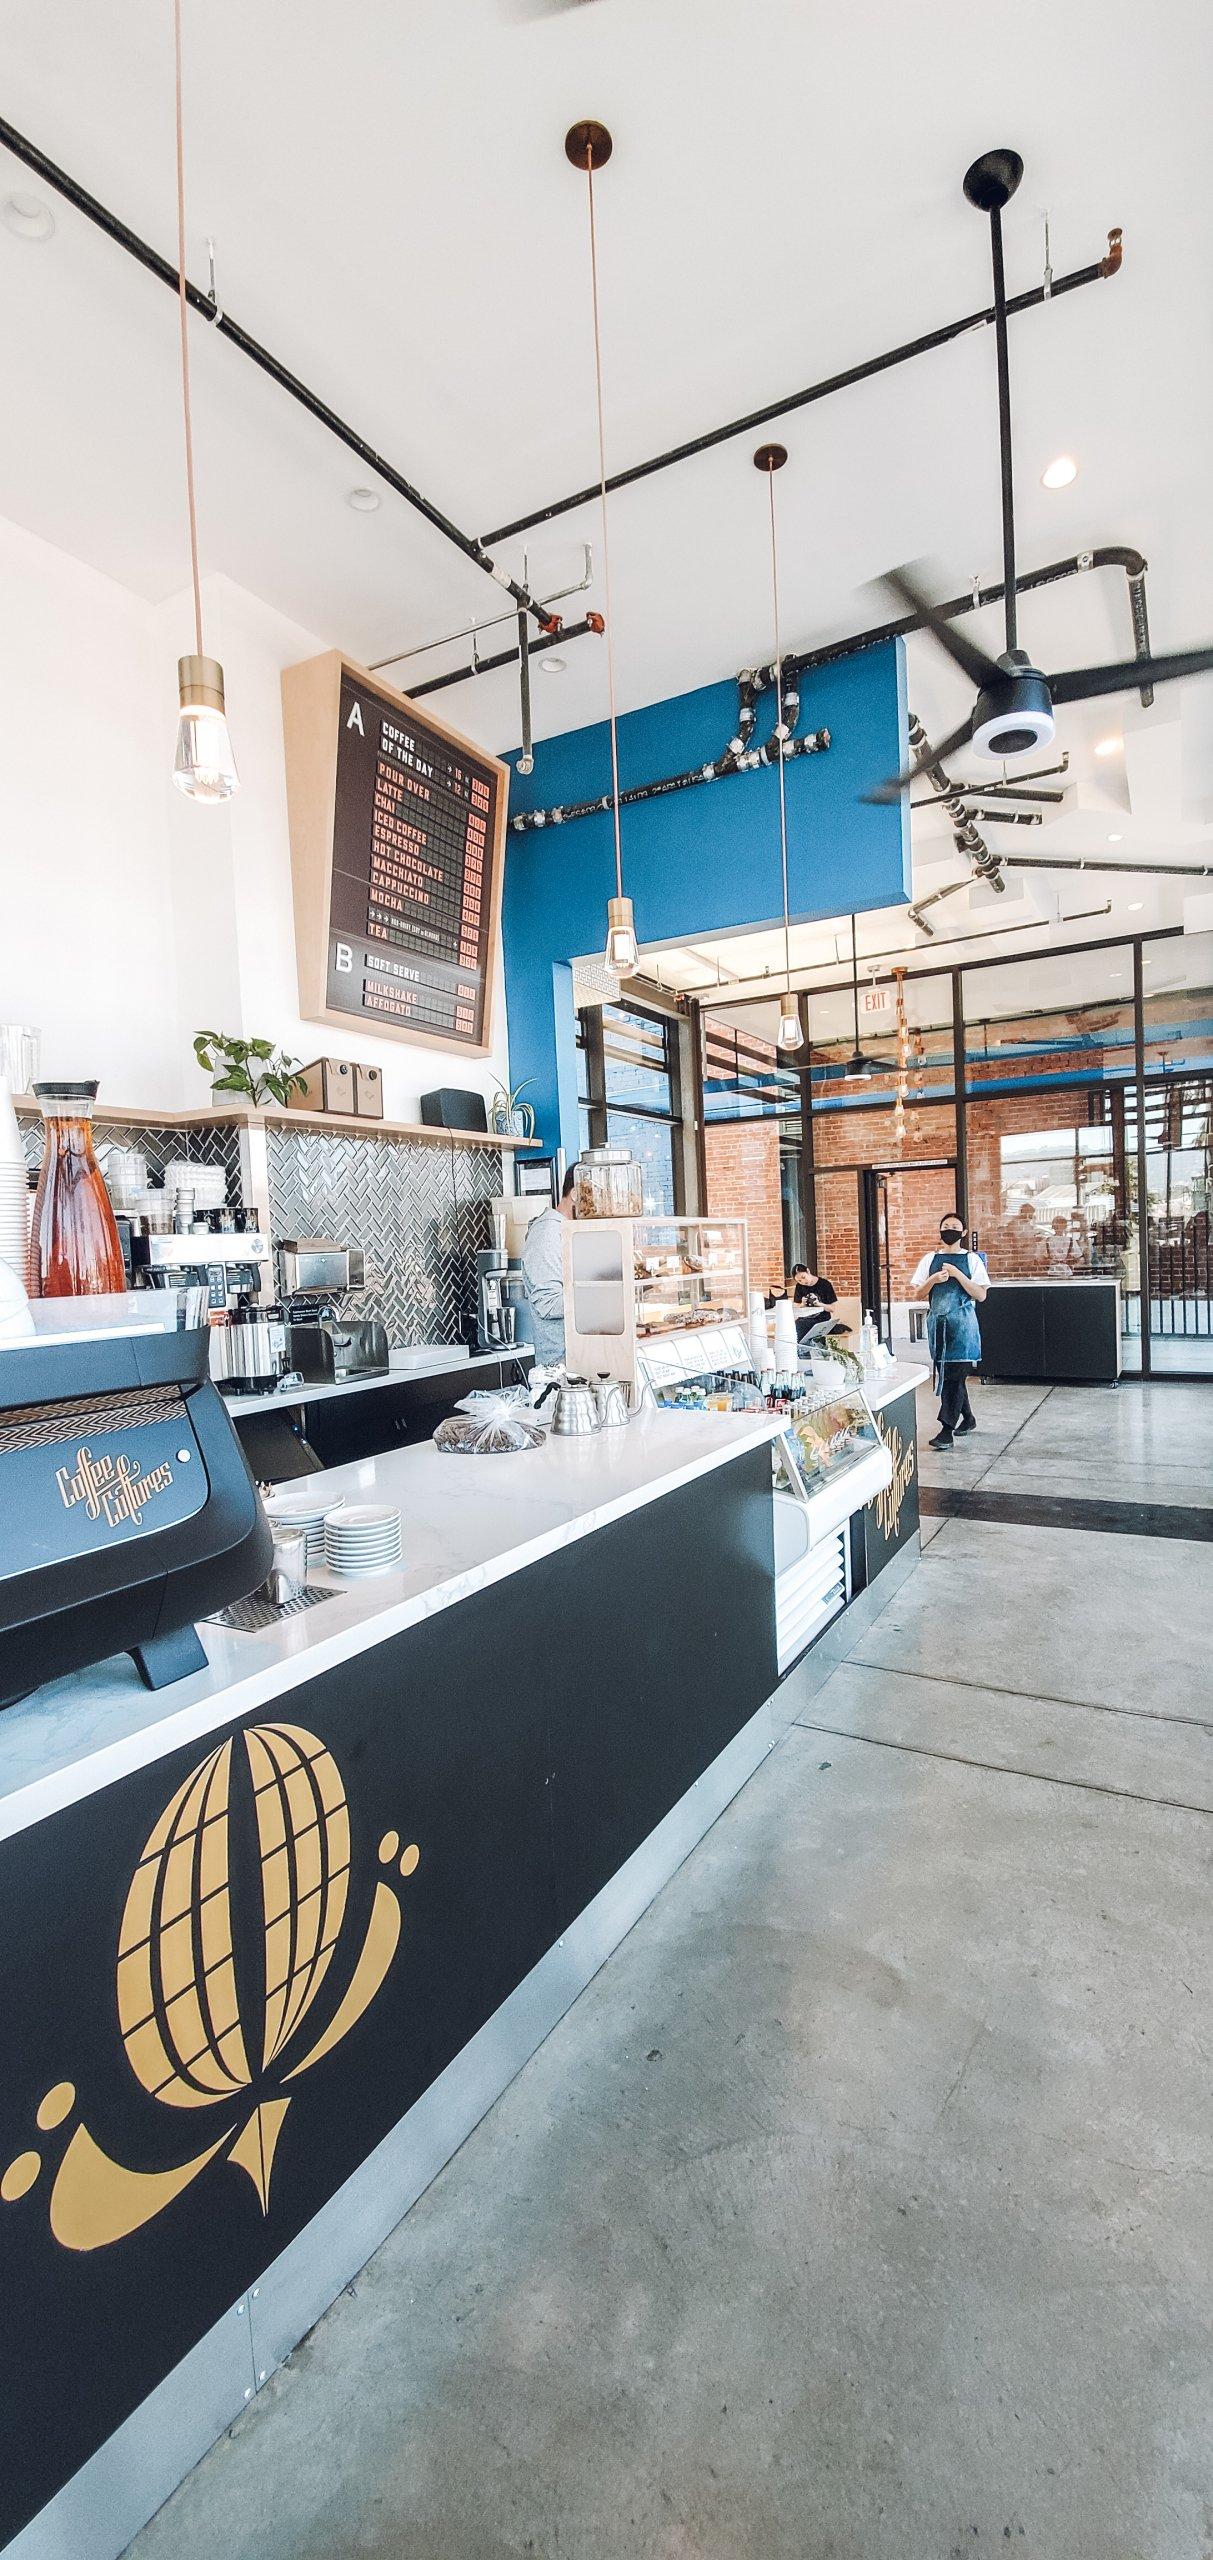 Interior of coffee cultures